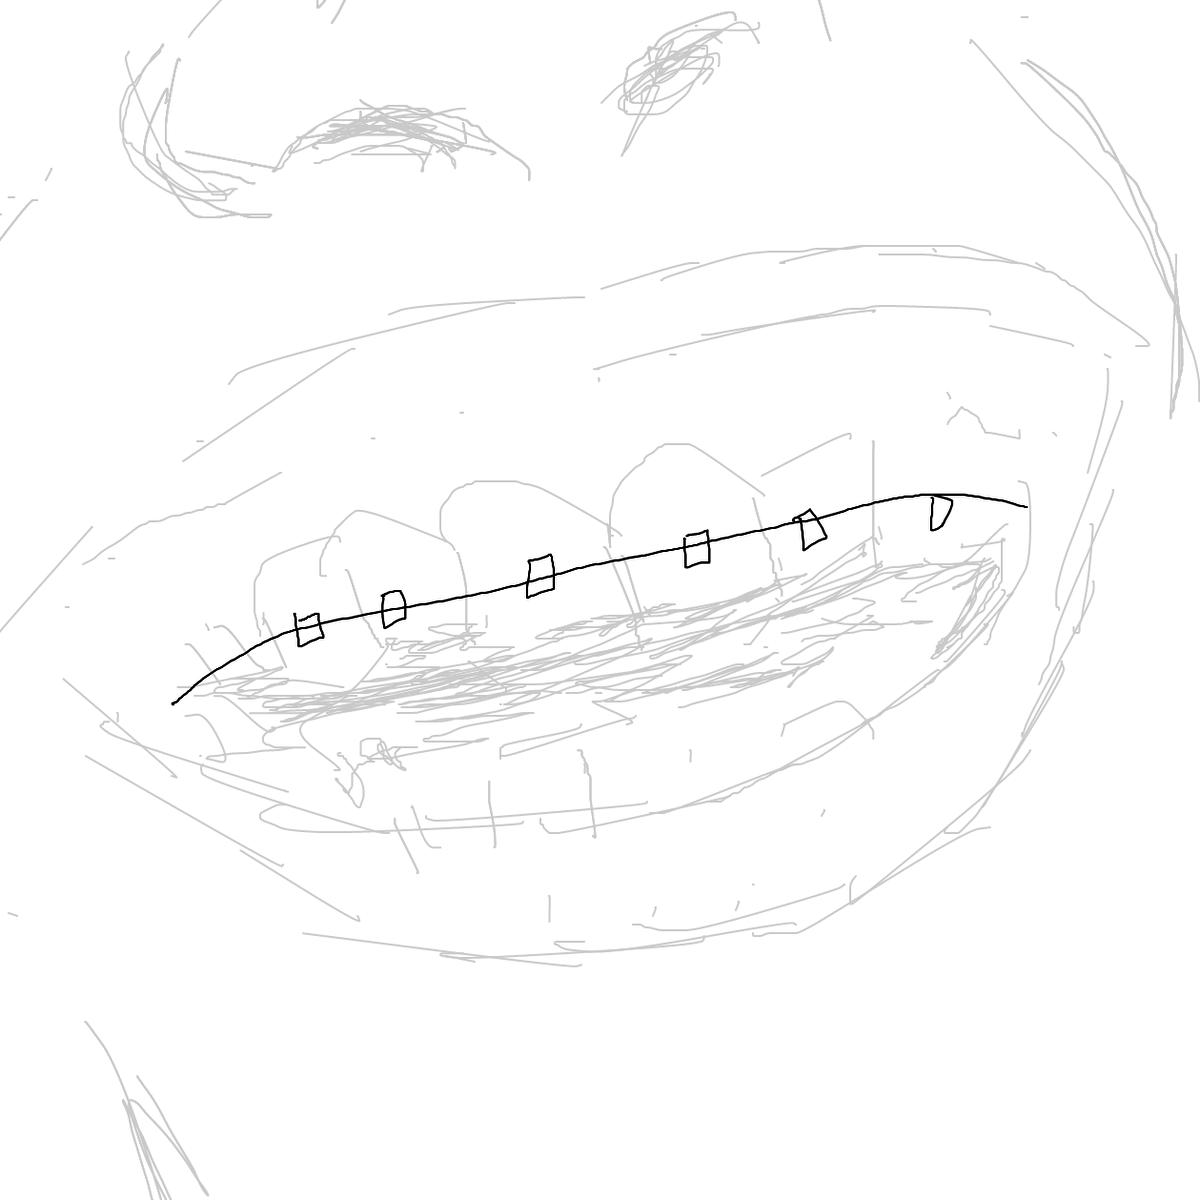 BAAAM drawing#8514 lat:51.3322715759277340lng: 12.3620405197143550